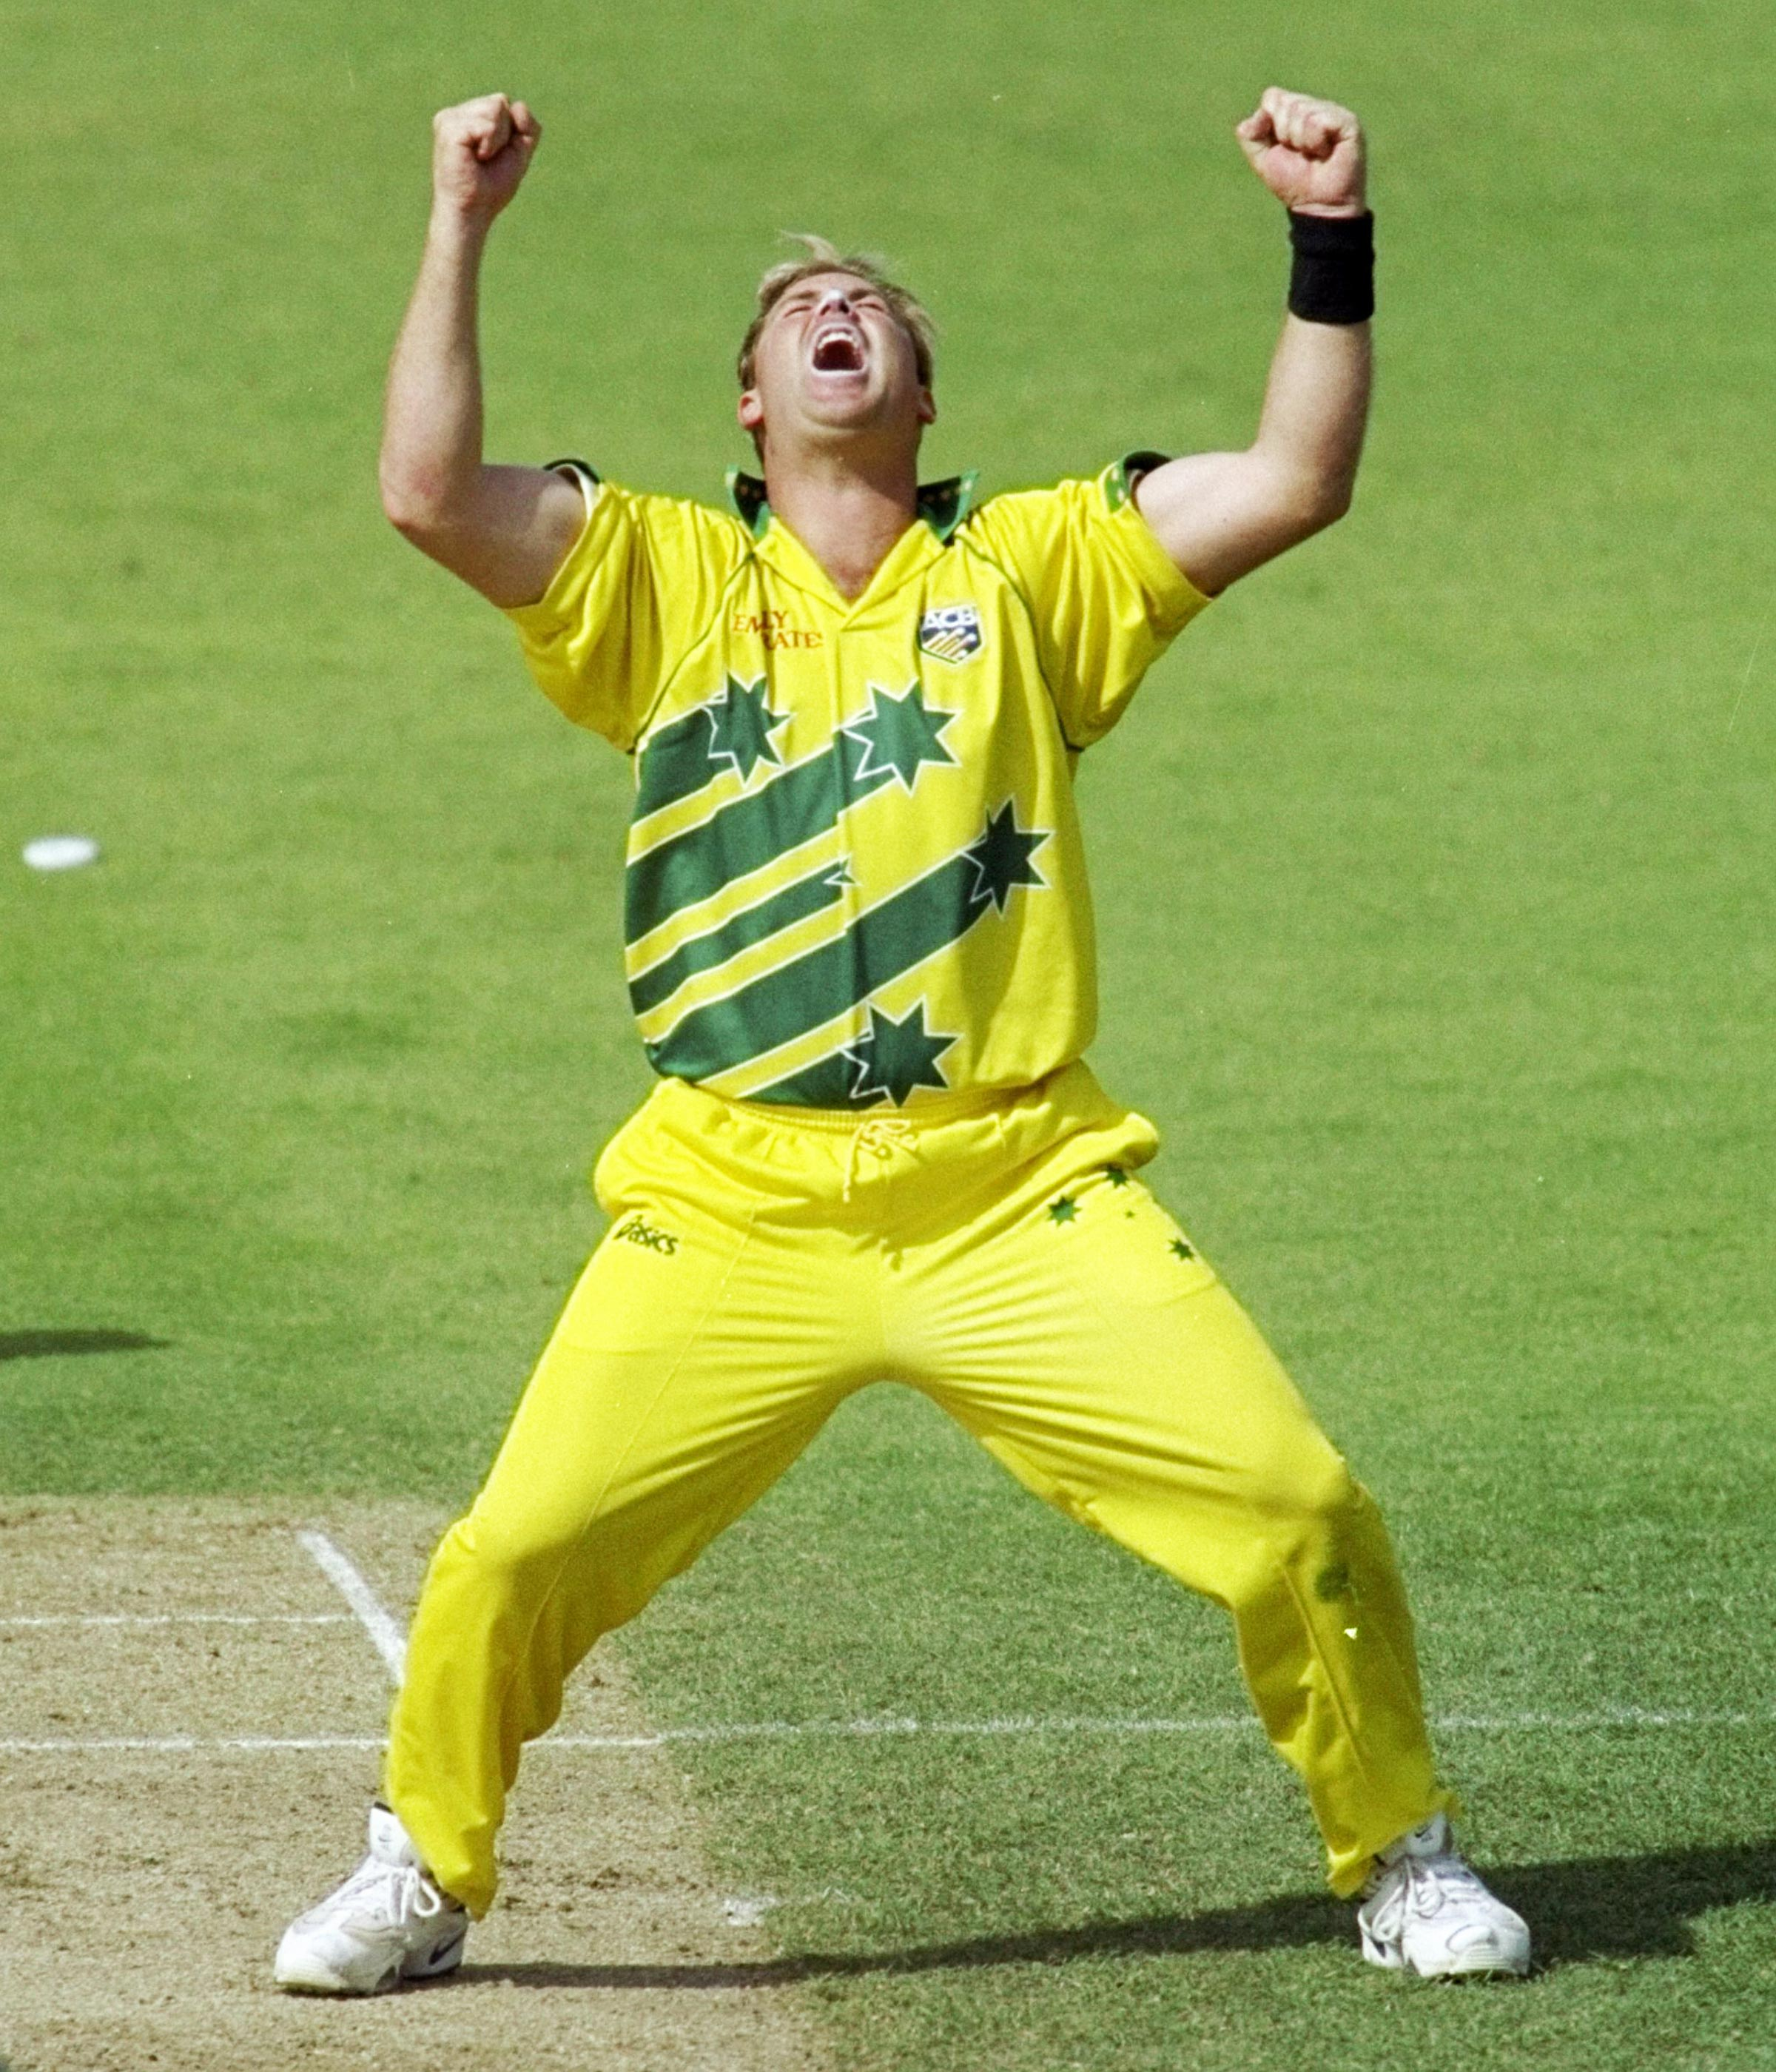 Shane Warne fired Australia's Cup triumph